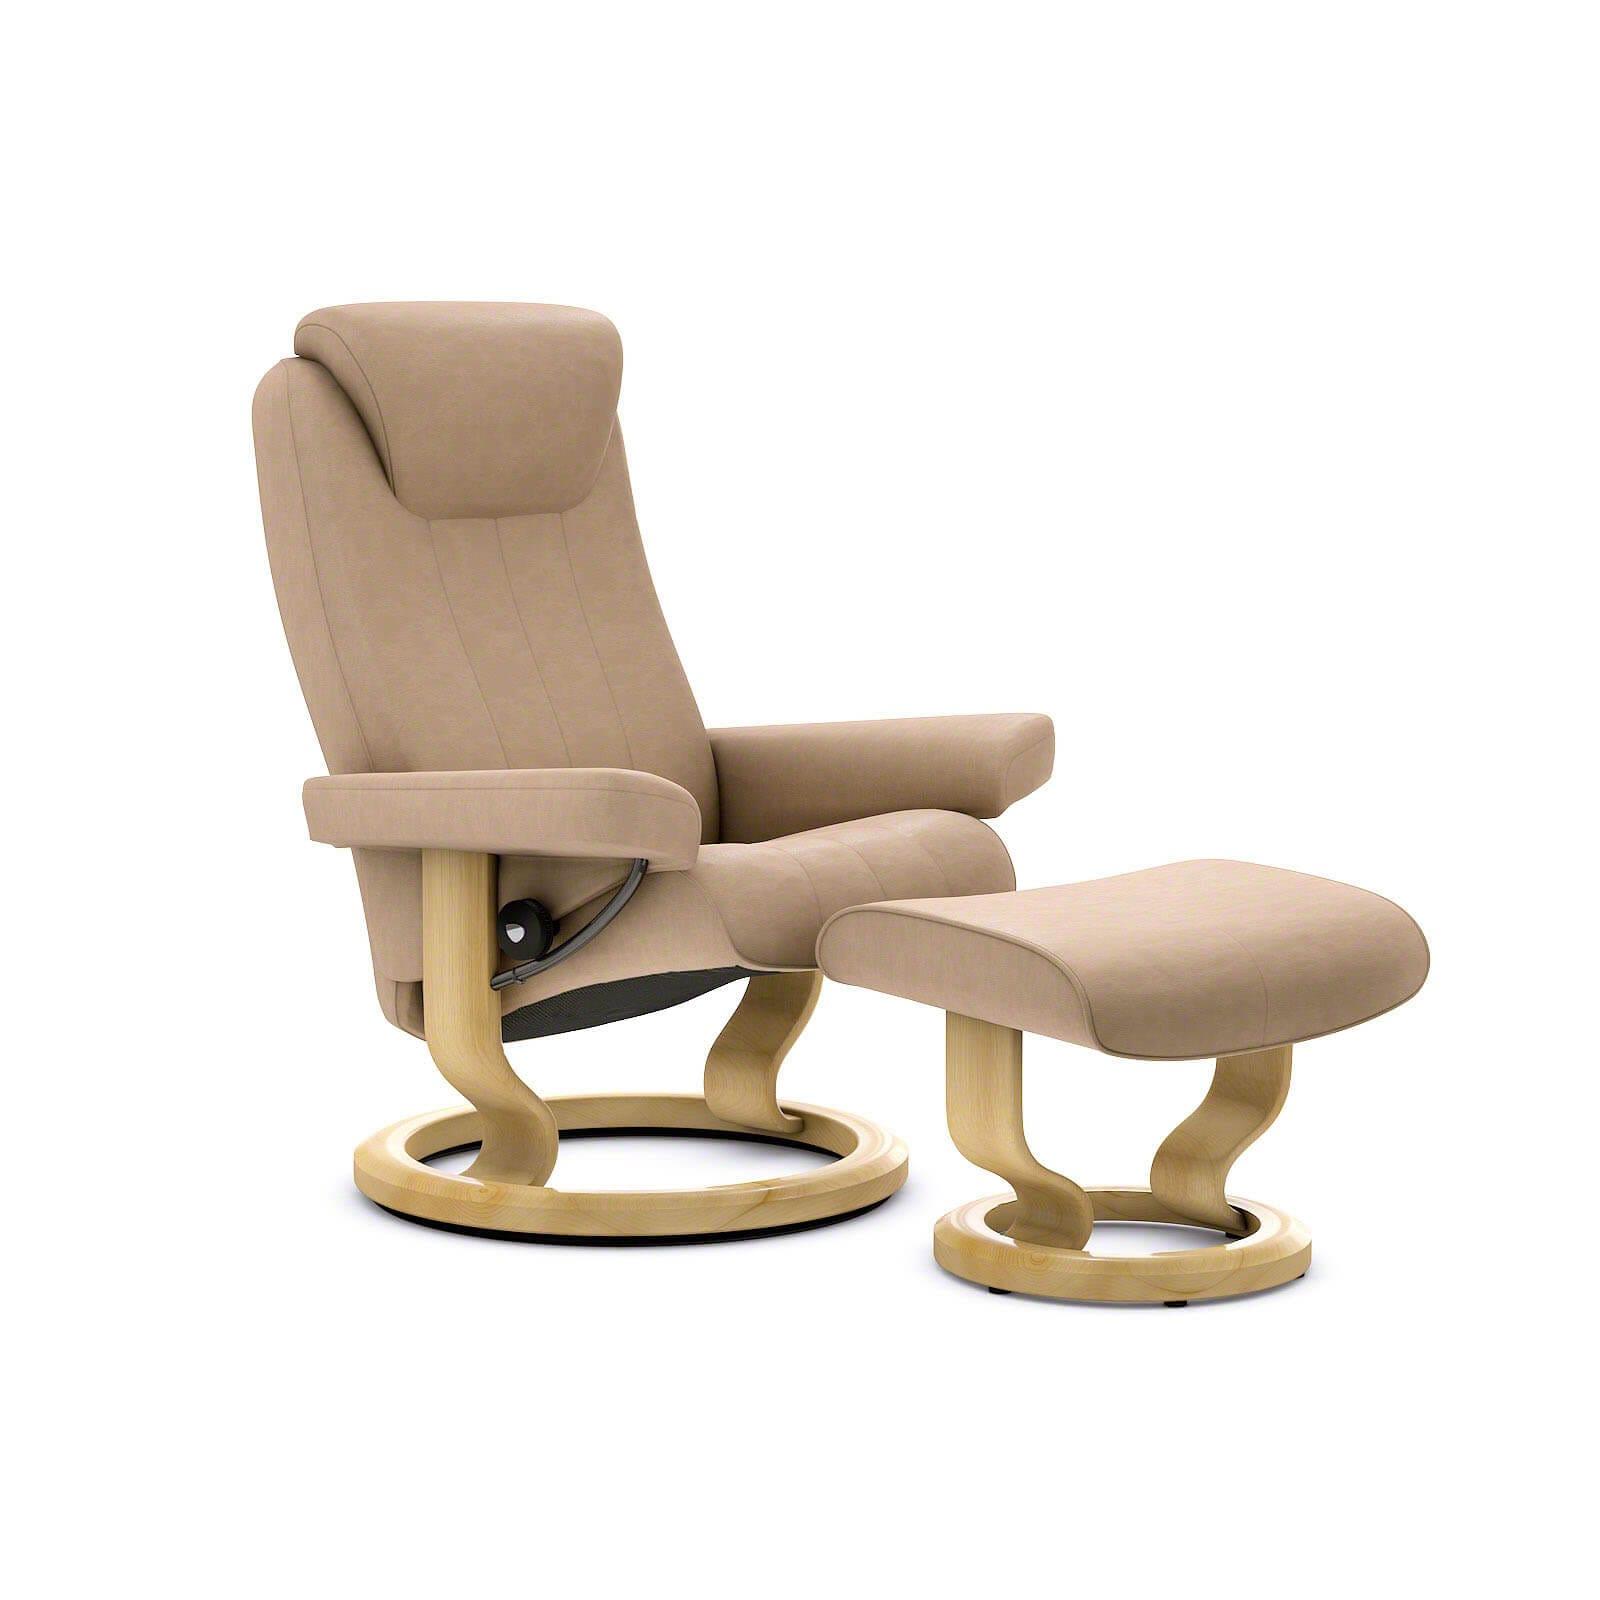 stressless bliss sessel paloma sand mit hocker stressless. Black Bedroom Furniture Sets. Home Design Ideas